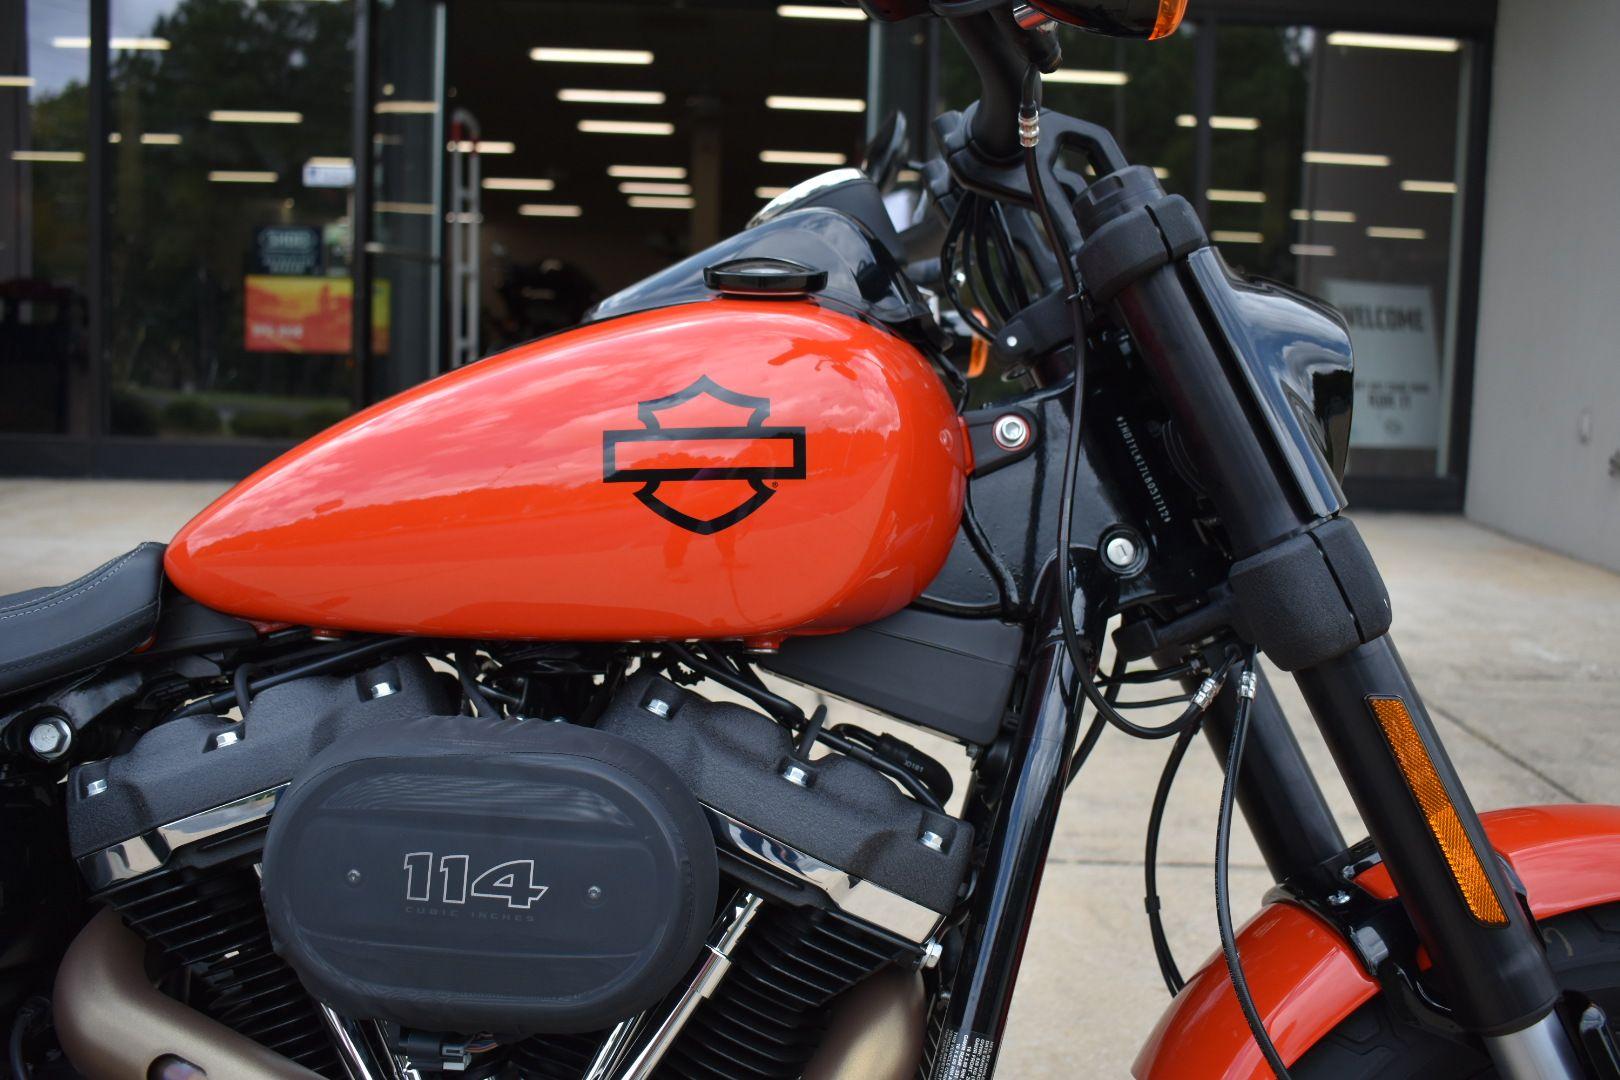 New 2020 Harley-Davidson Fat Bob 114 FXFBS